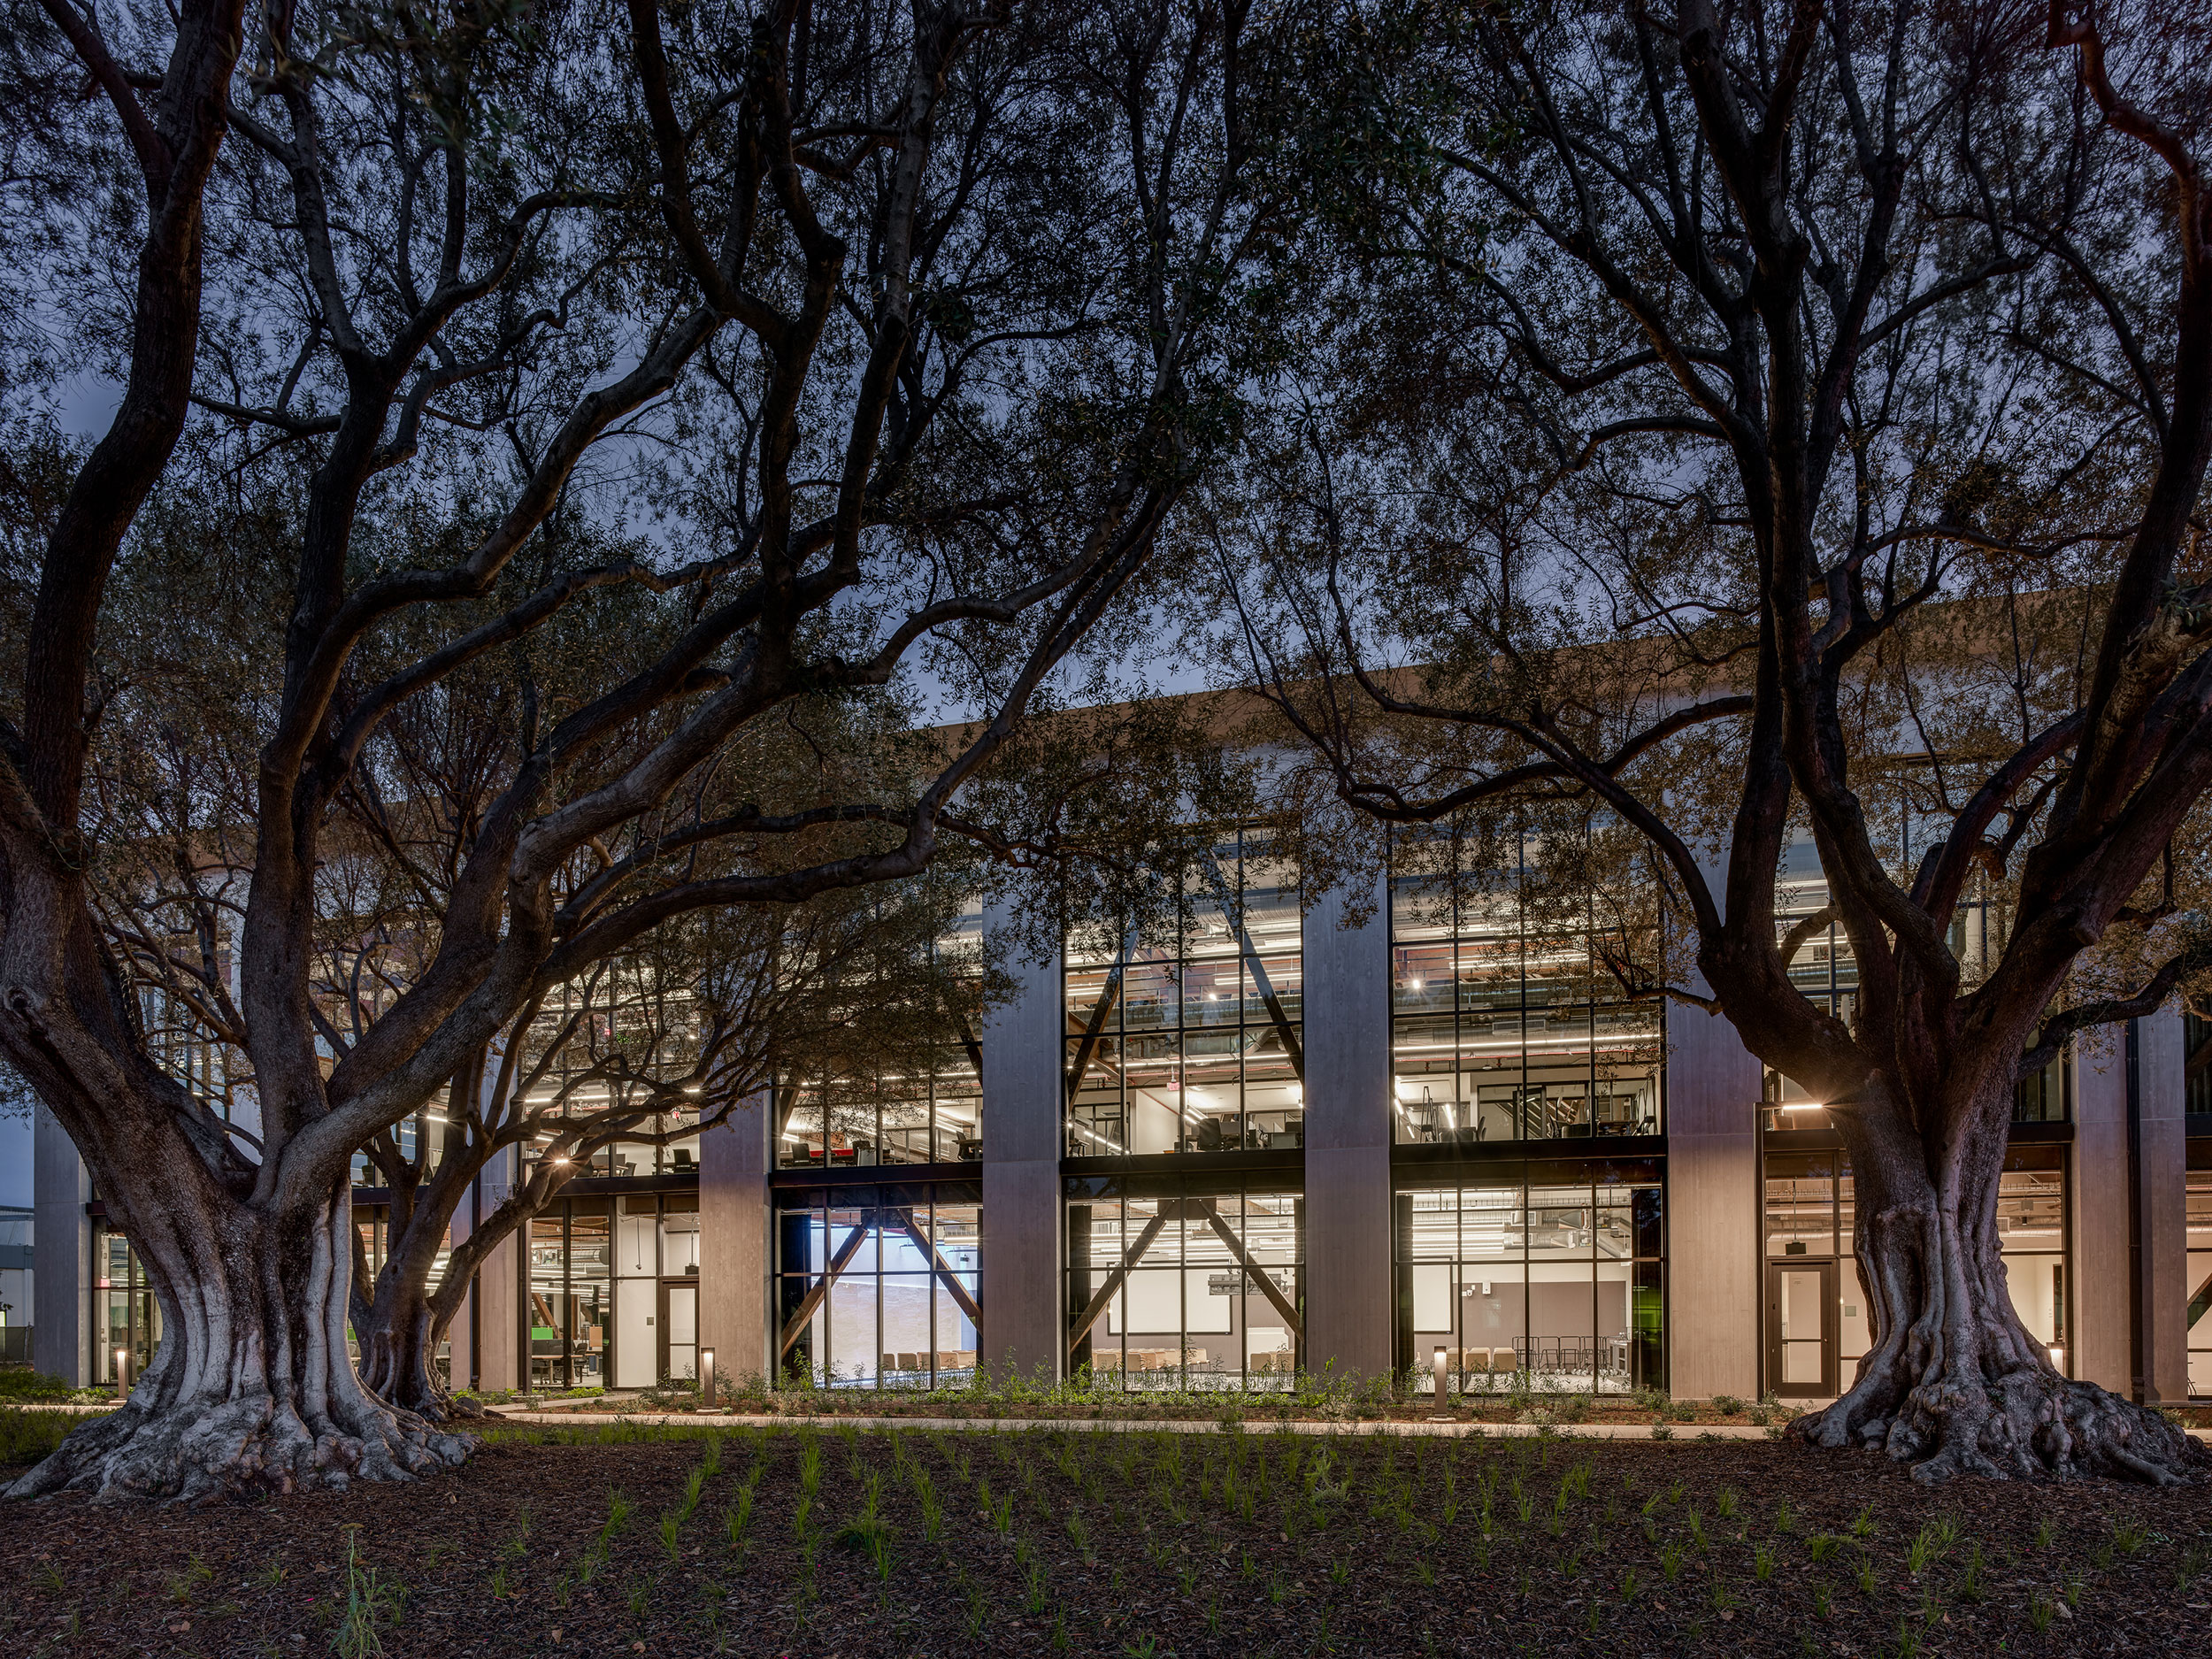 Google at 1212 Bordeaux, Trees, Lights, Night, Structure, Concrete, Nature, Biophilia